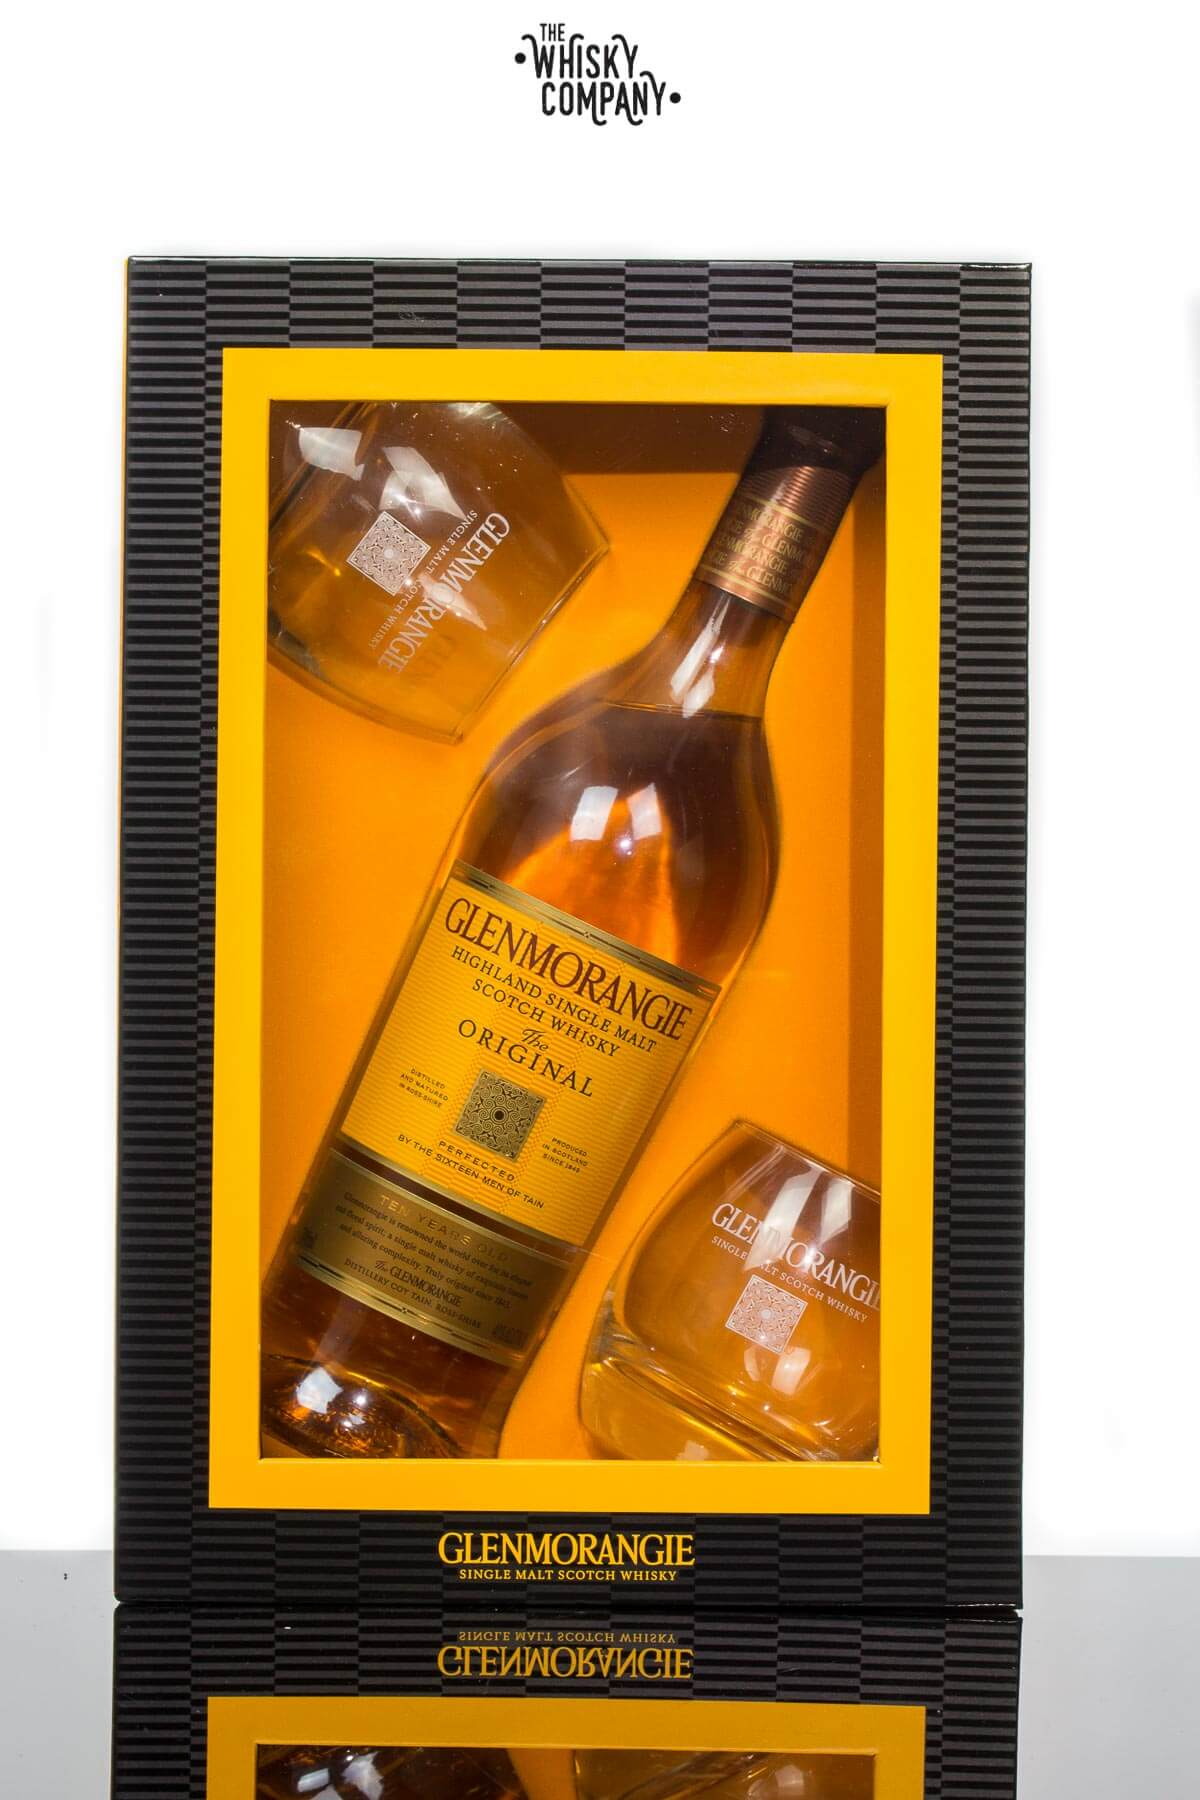 Glenmorangie The Original 10 Years Old Highland Single Malt Scotch Whisky Gift Pack